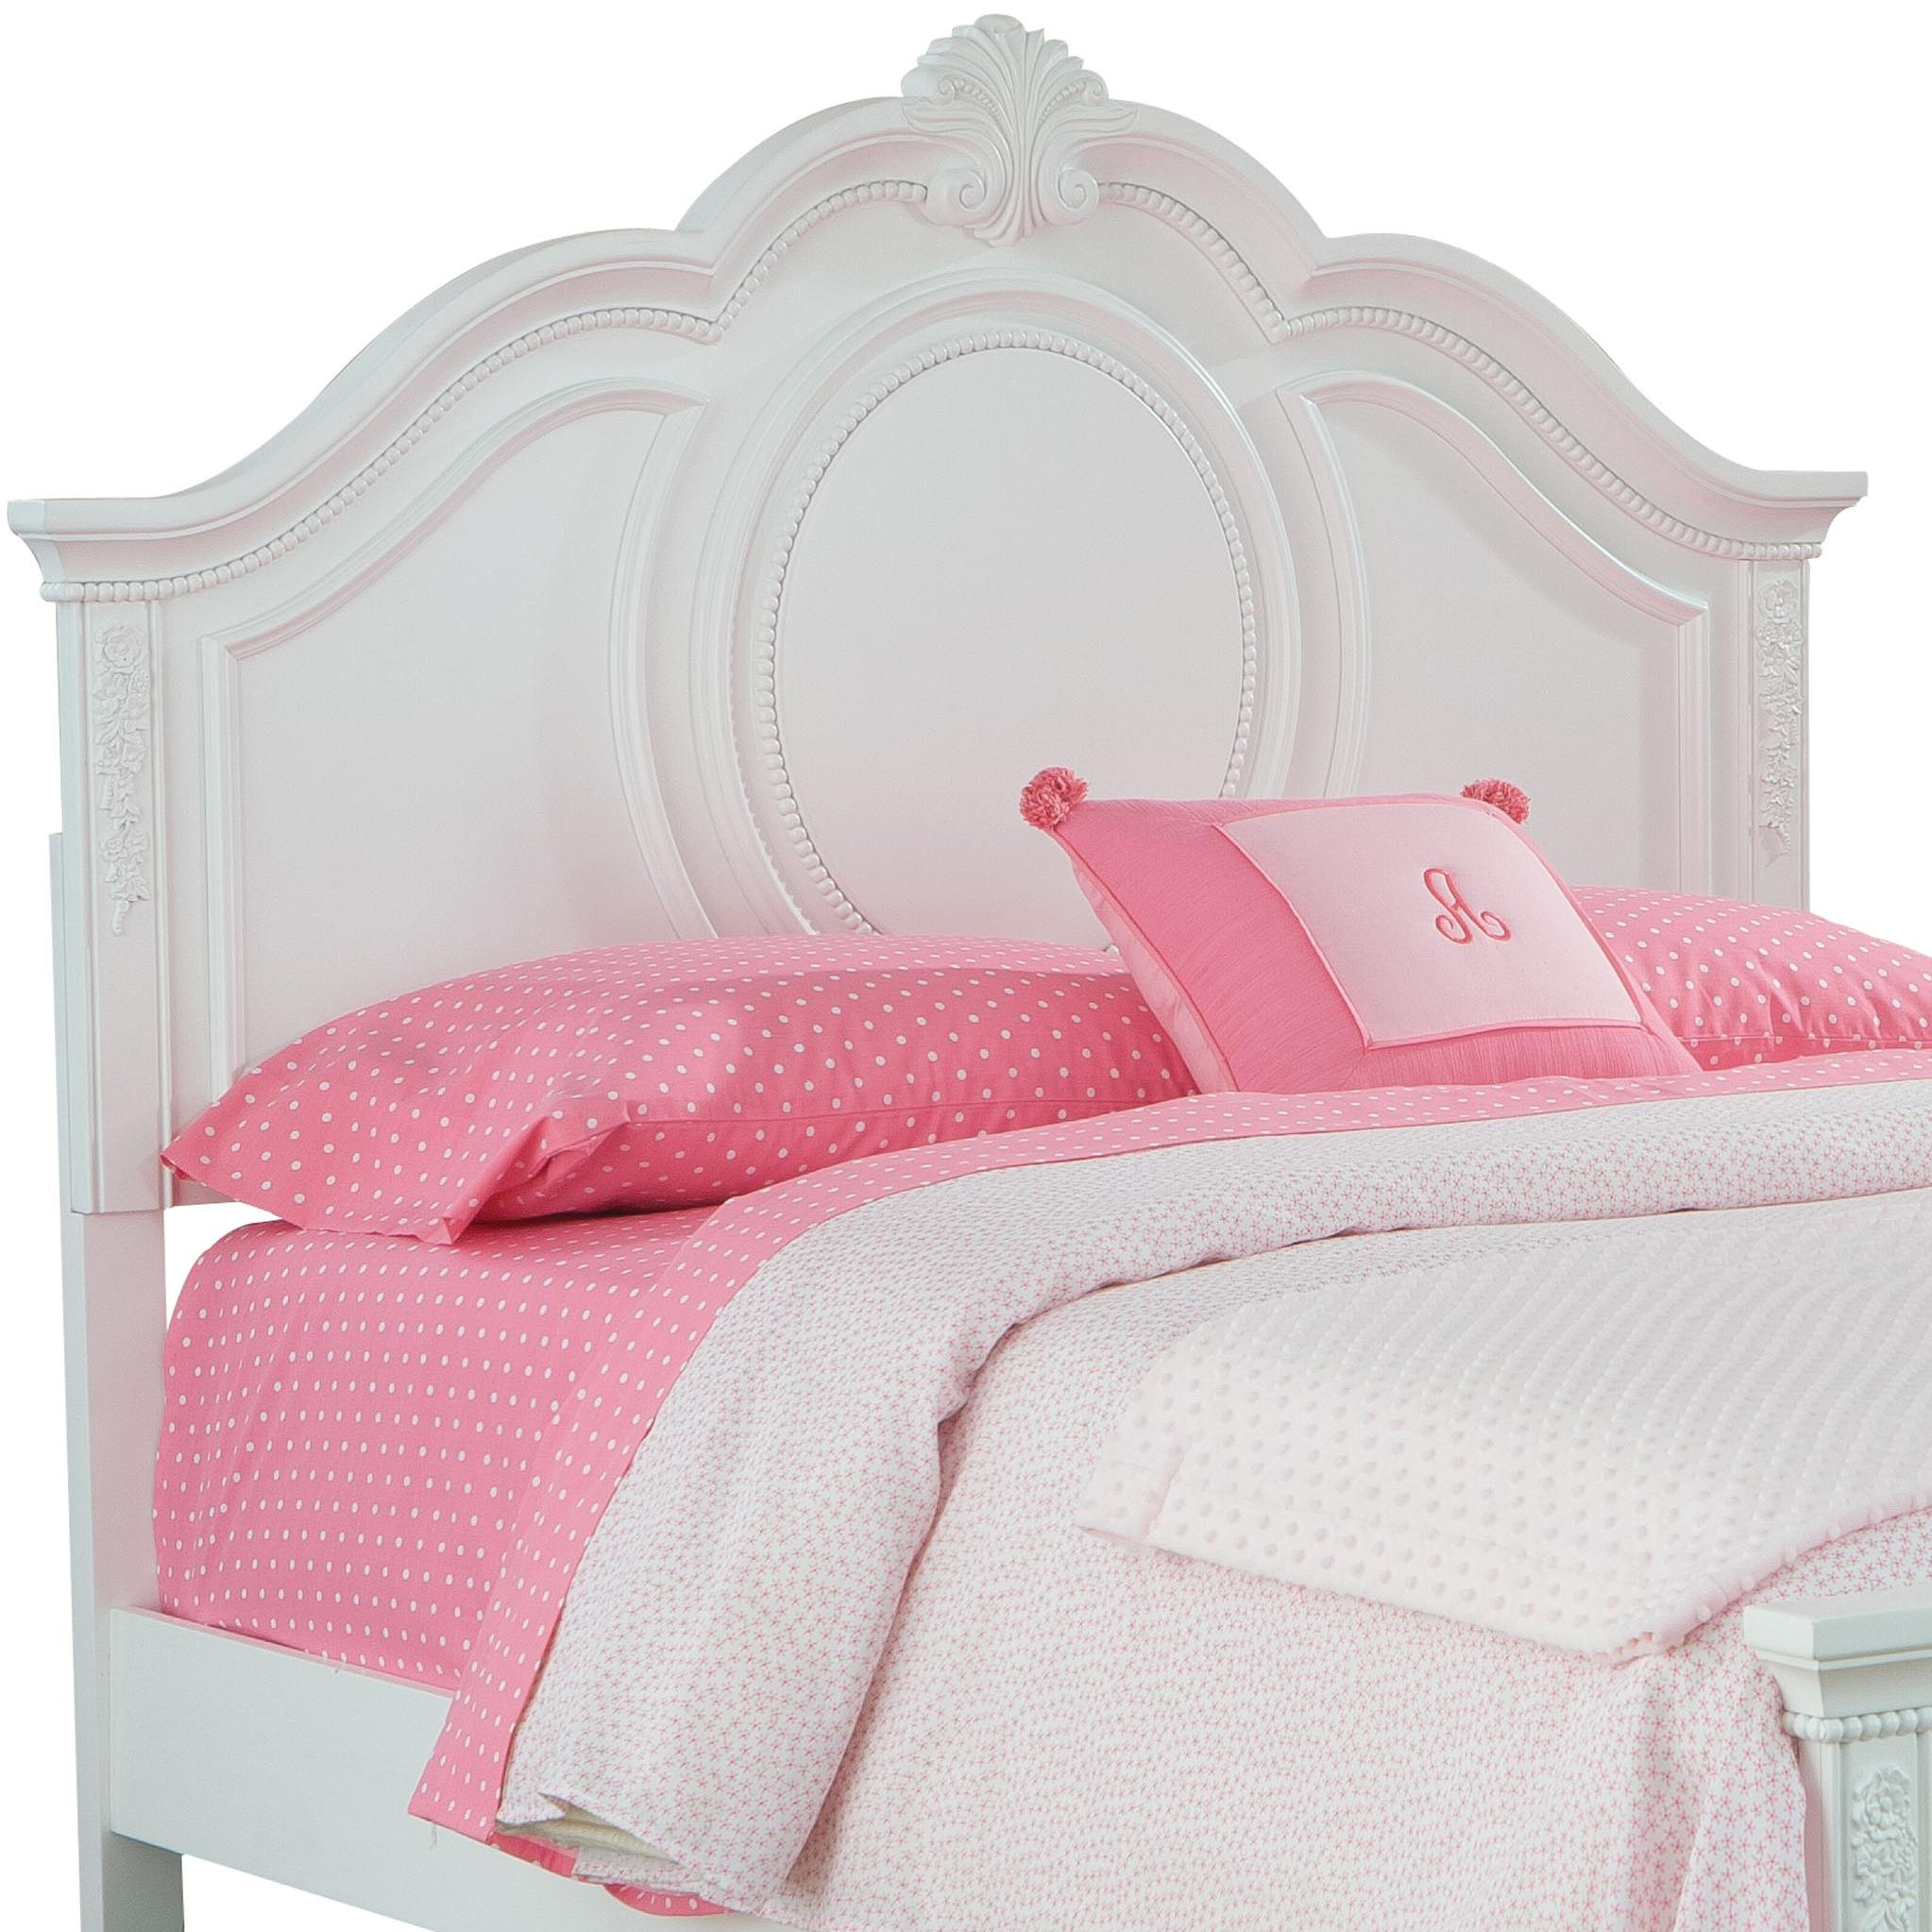 Standard Furniture Jessica Full Headboard - Item Number: 94211